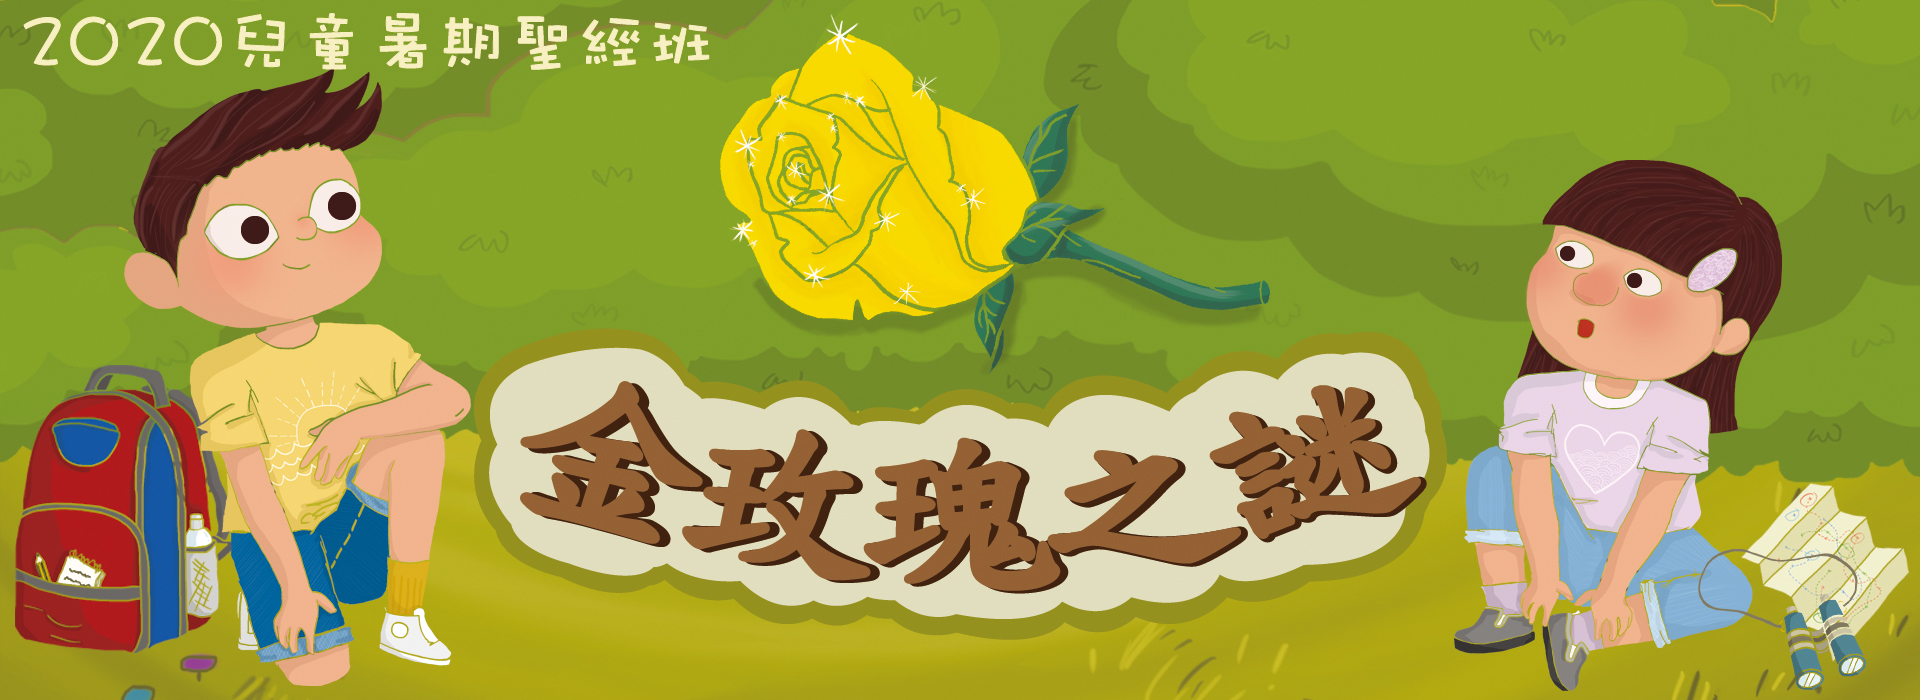 banner2020-01